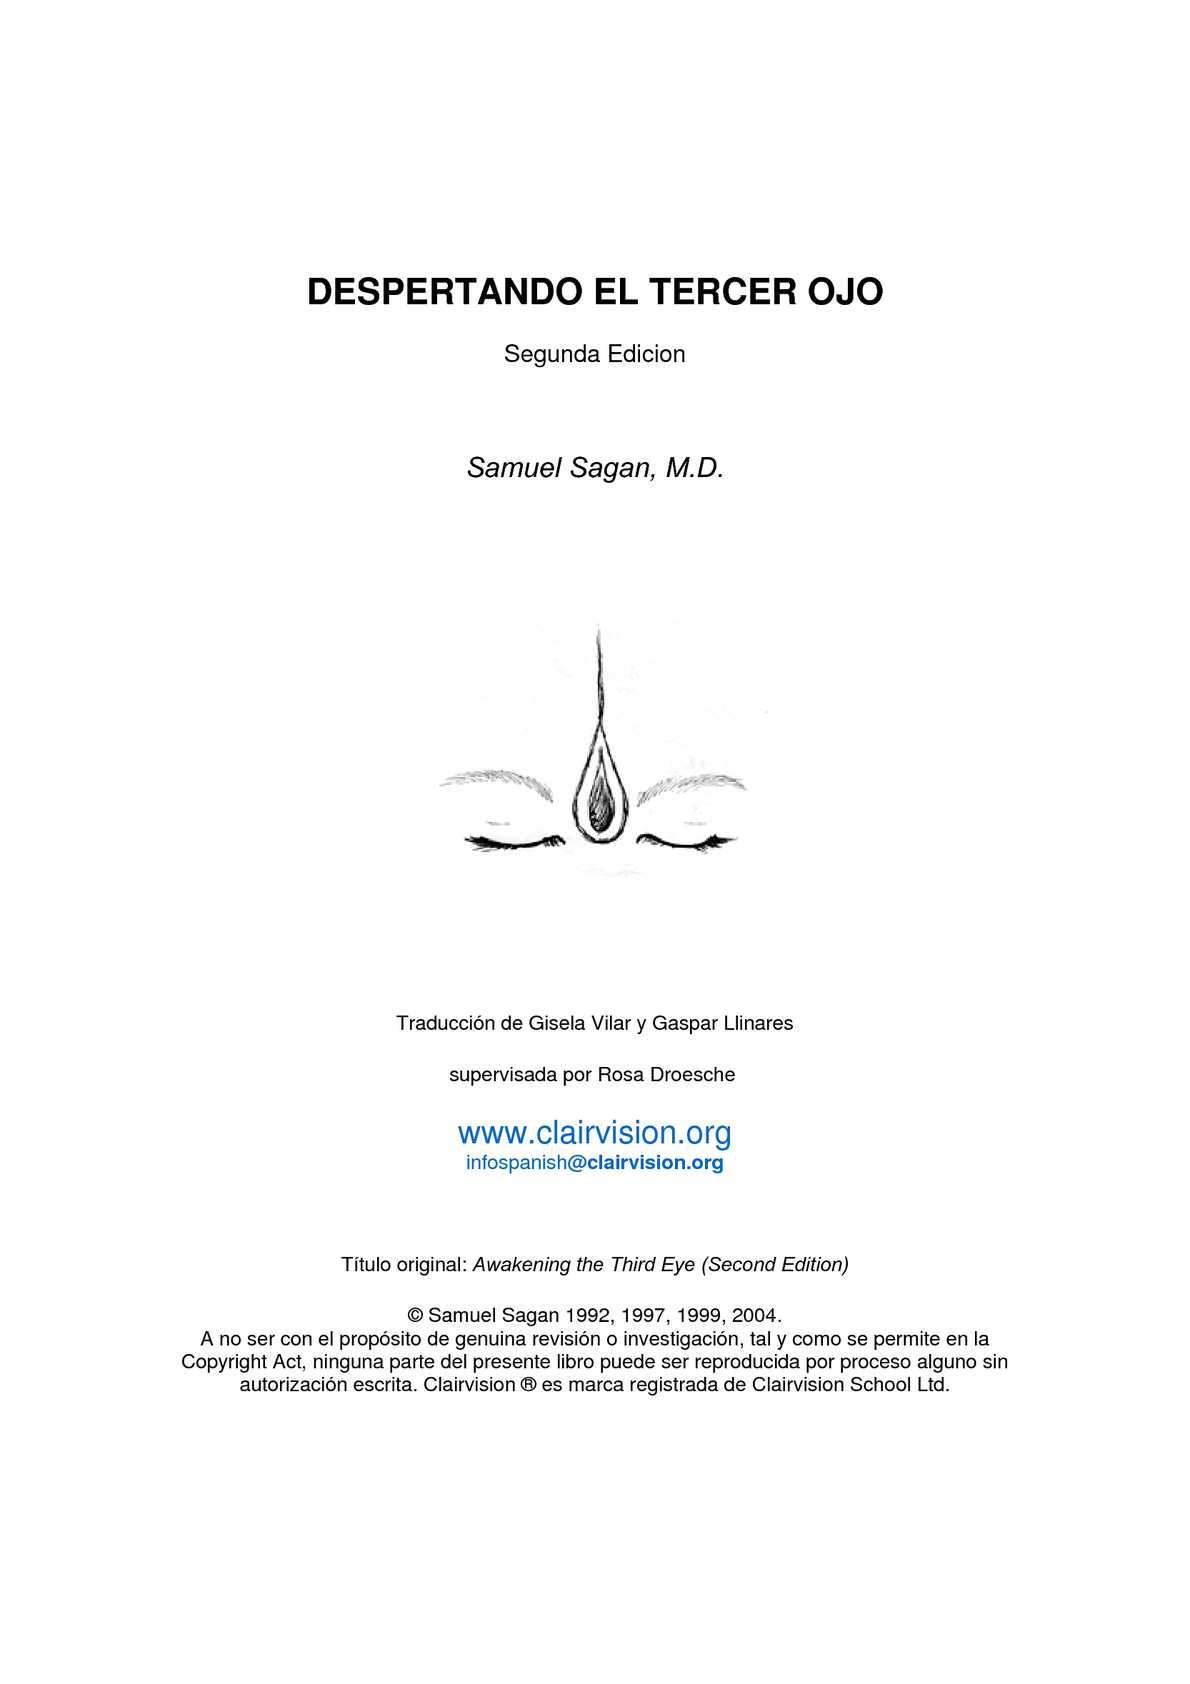 Calaméo - DESPERTANDO EL TERCER OJO. Samuel Sagan, M.D. (segunda ...